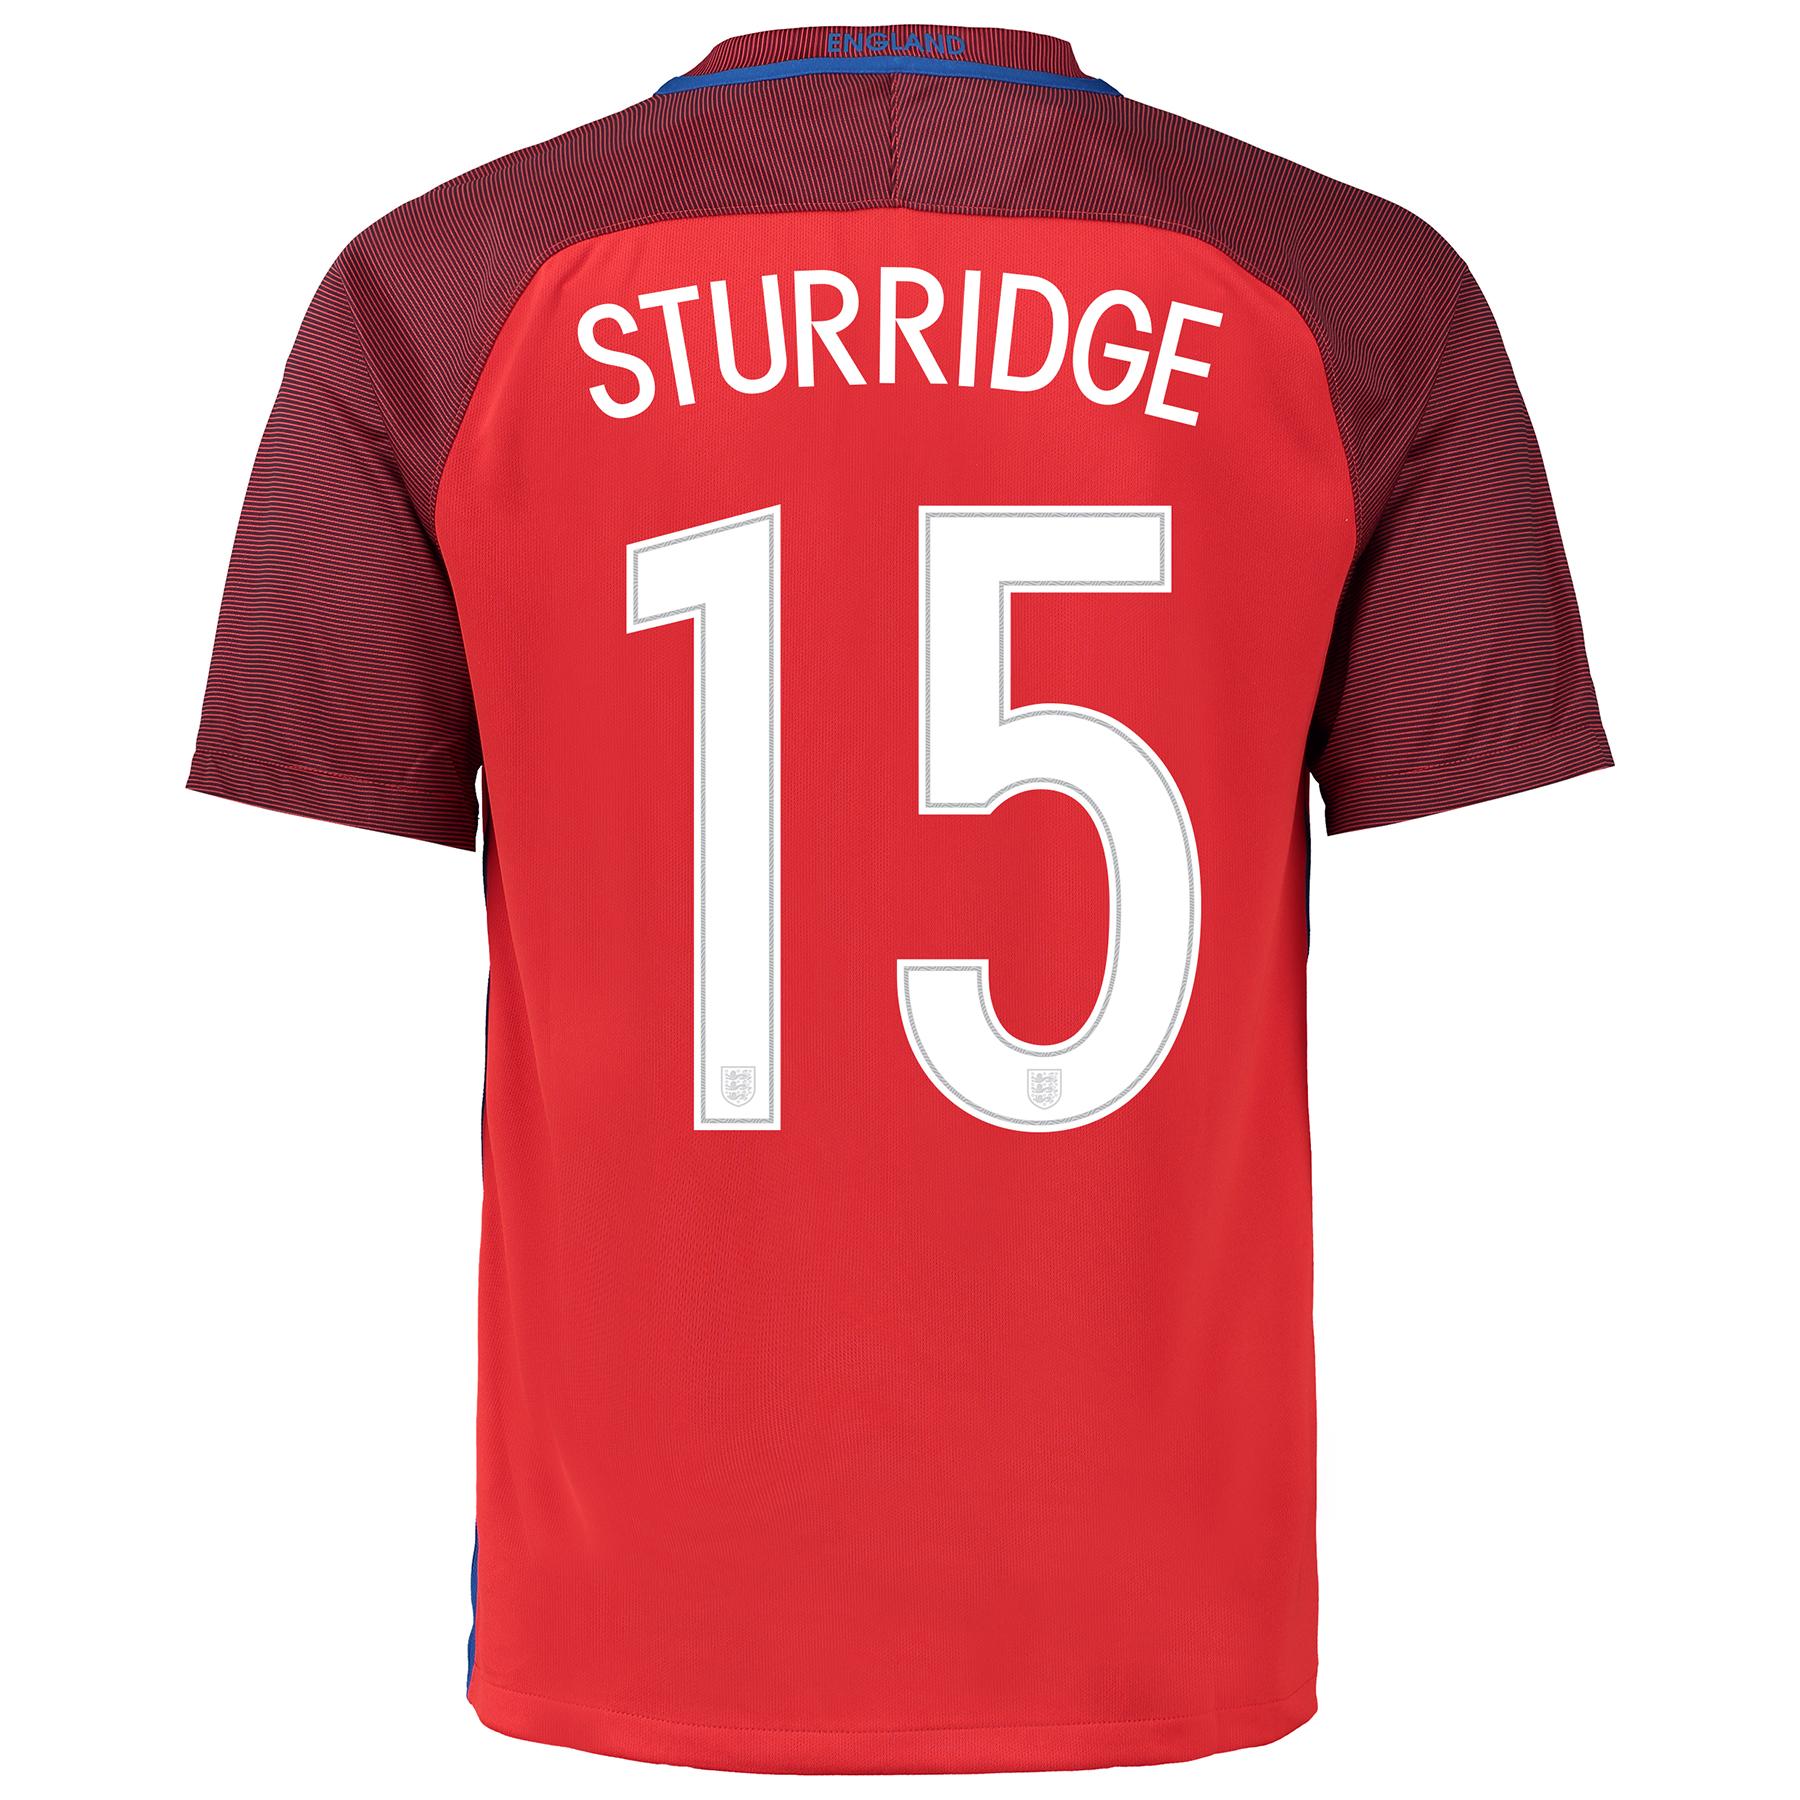 Image of England Away Shirt 2016 with Sturridge 15 printing, Red